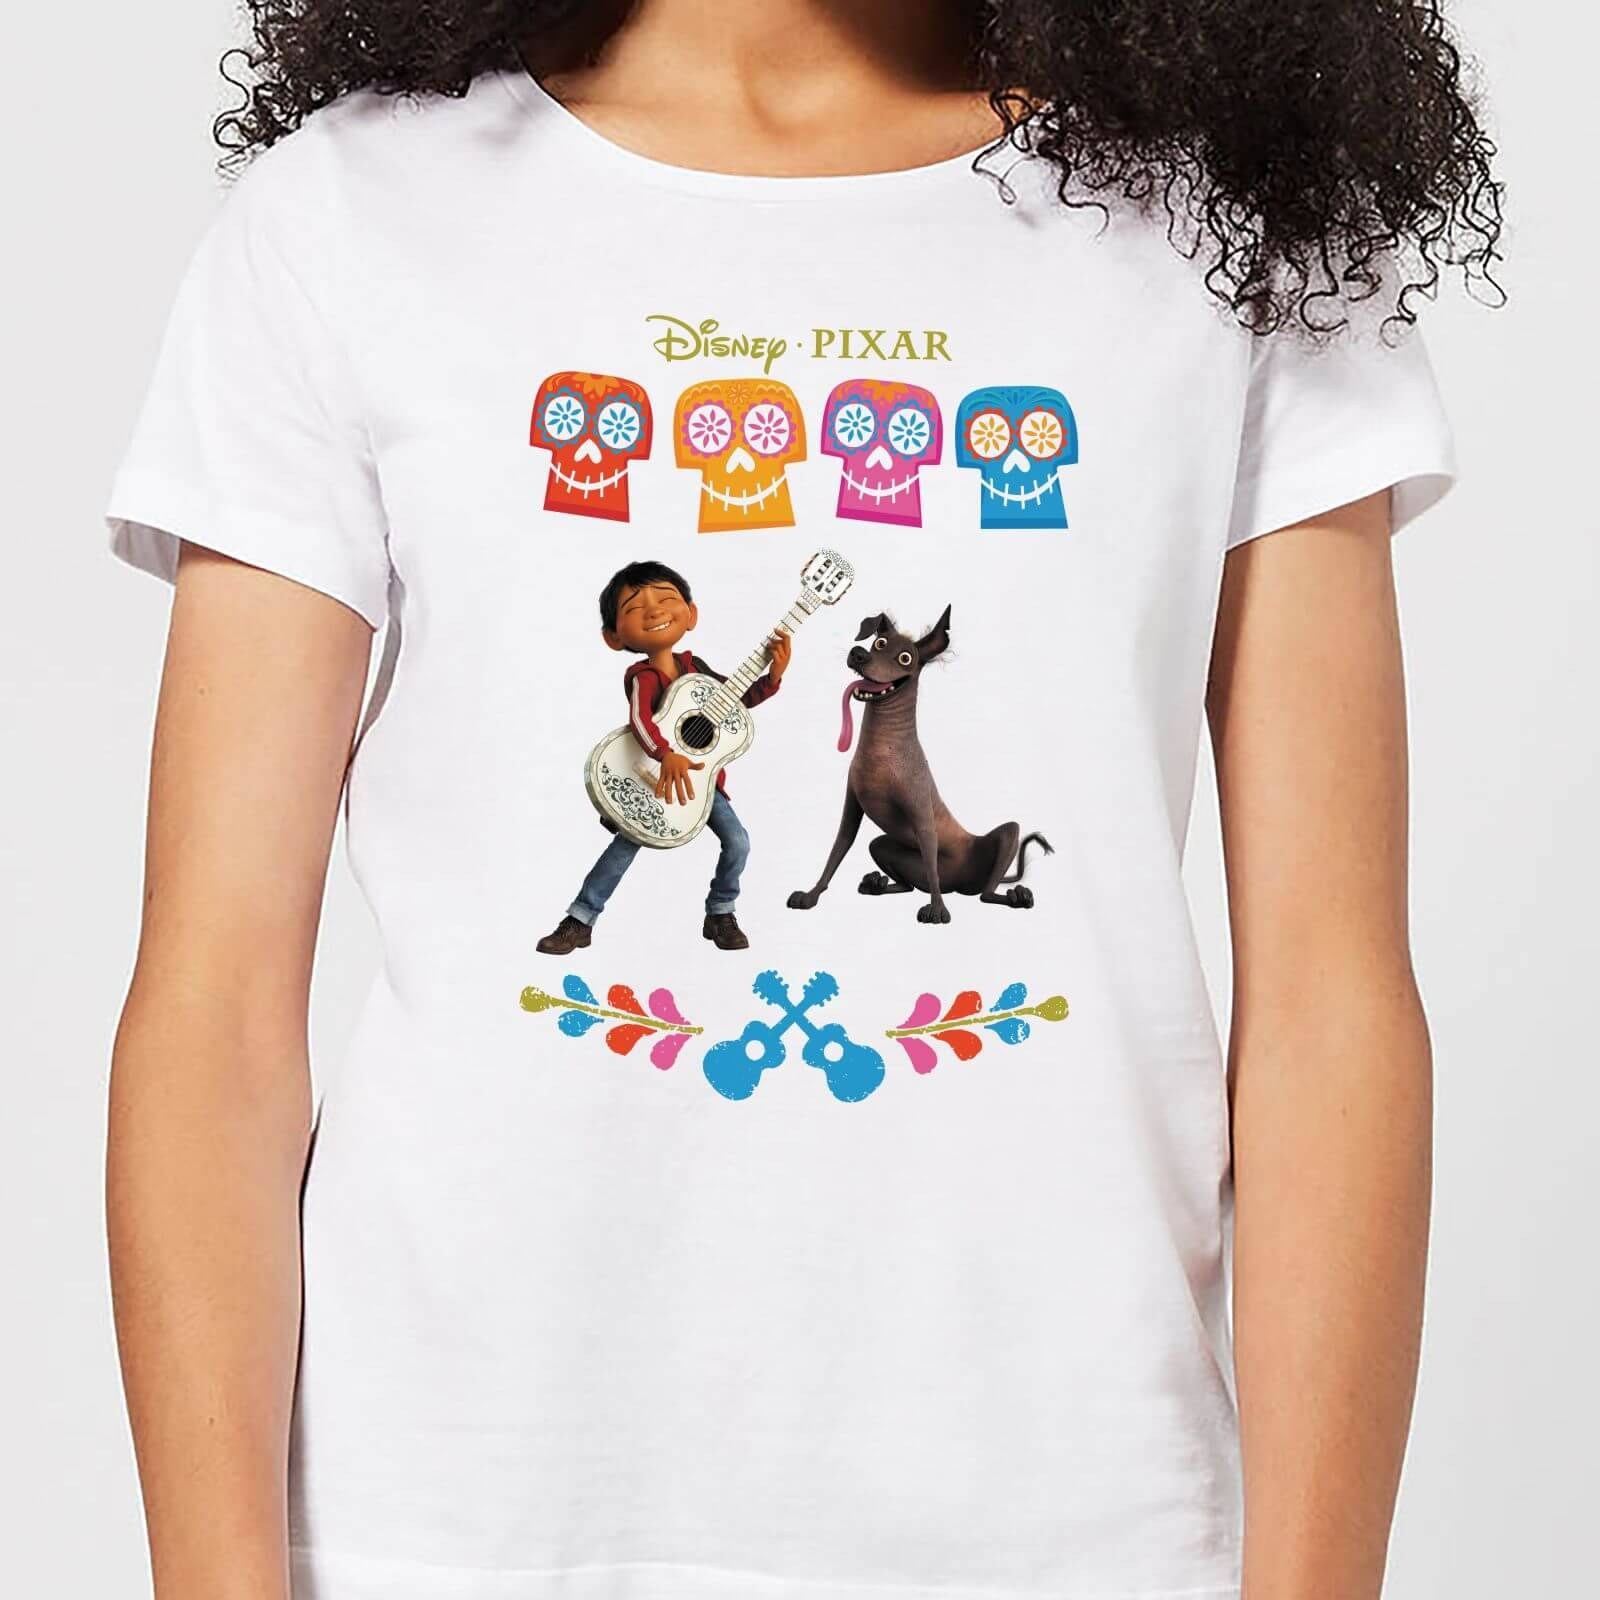 Disney Coco Miguel Logo Women's T-Shirt - White - XS - White